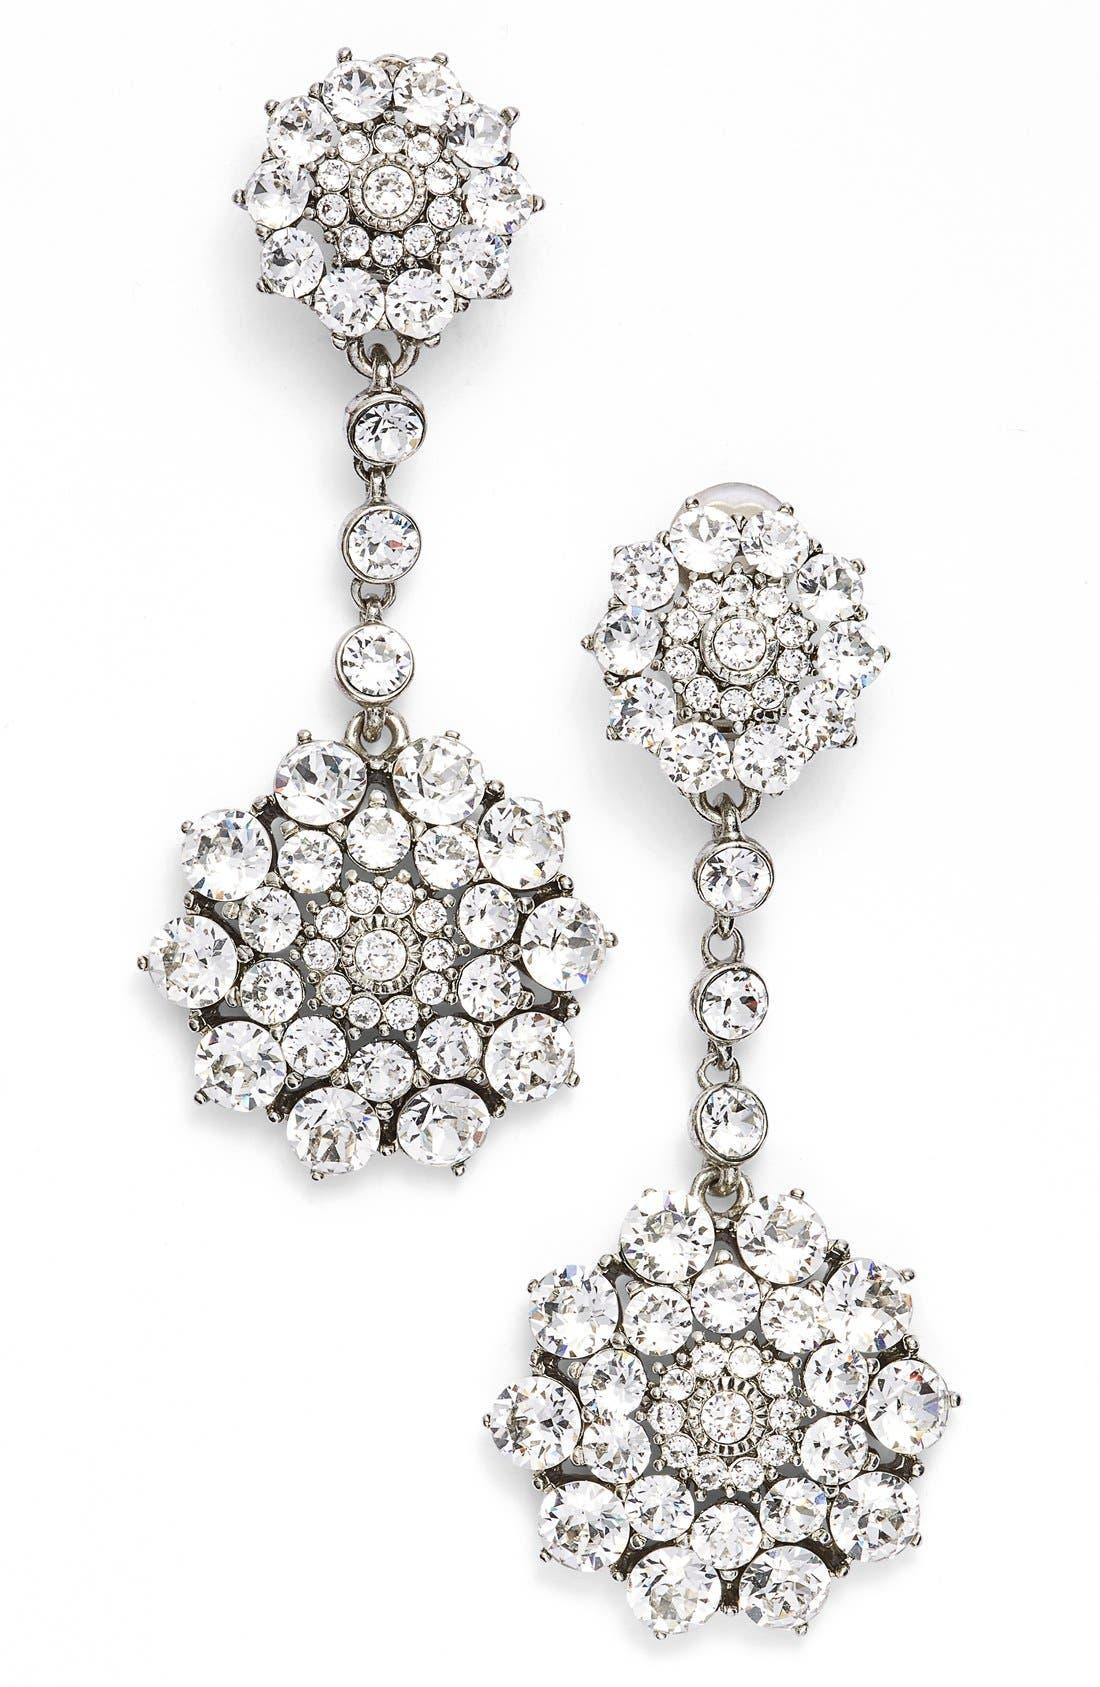 Alternate Image 1 Selected - Oscar de la Renta 'Classic Jeweled' Swarovski Crystal Drop Earrings